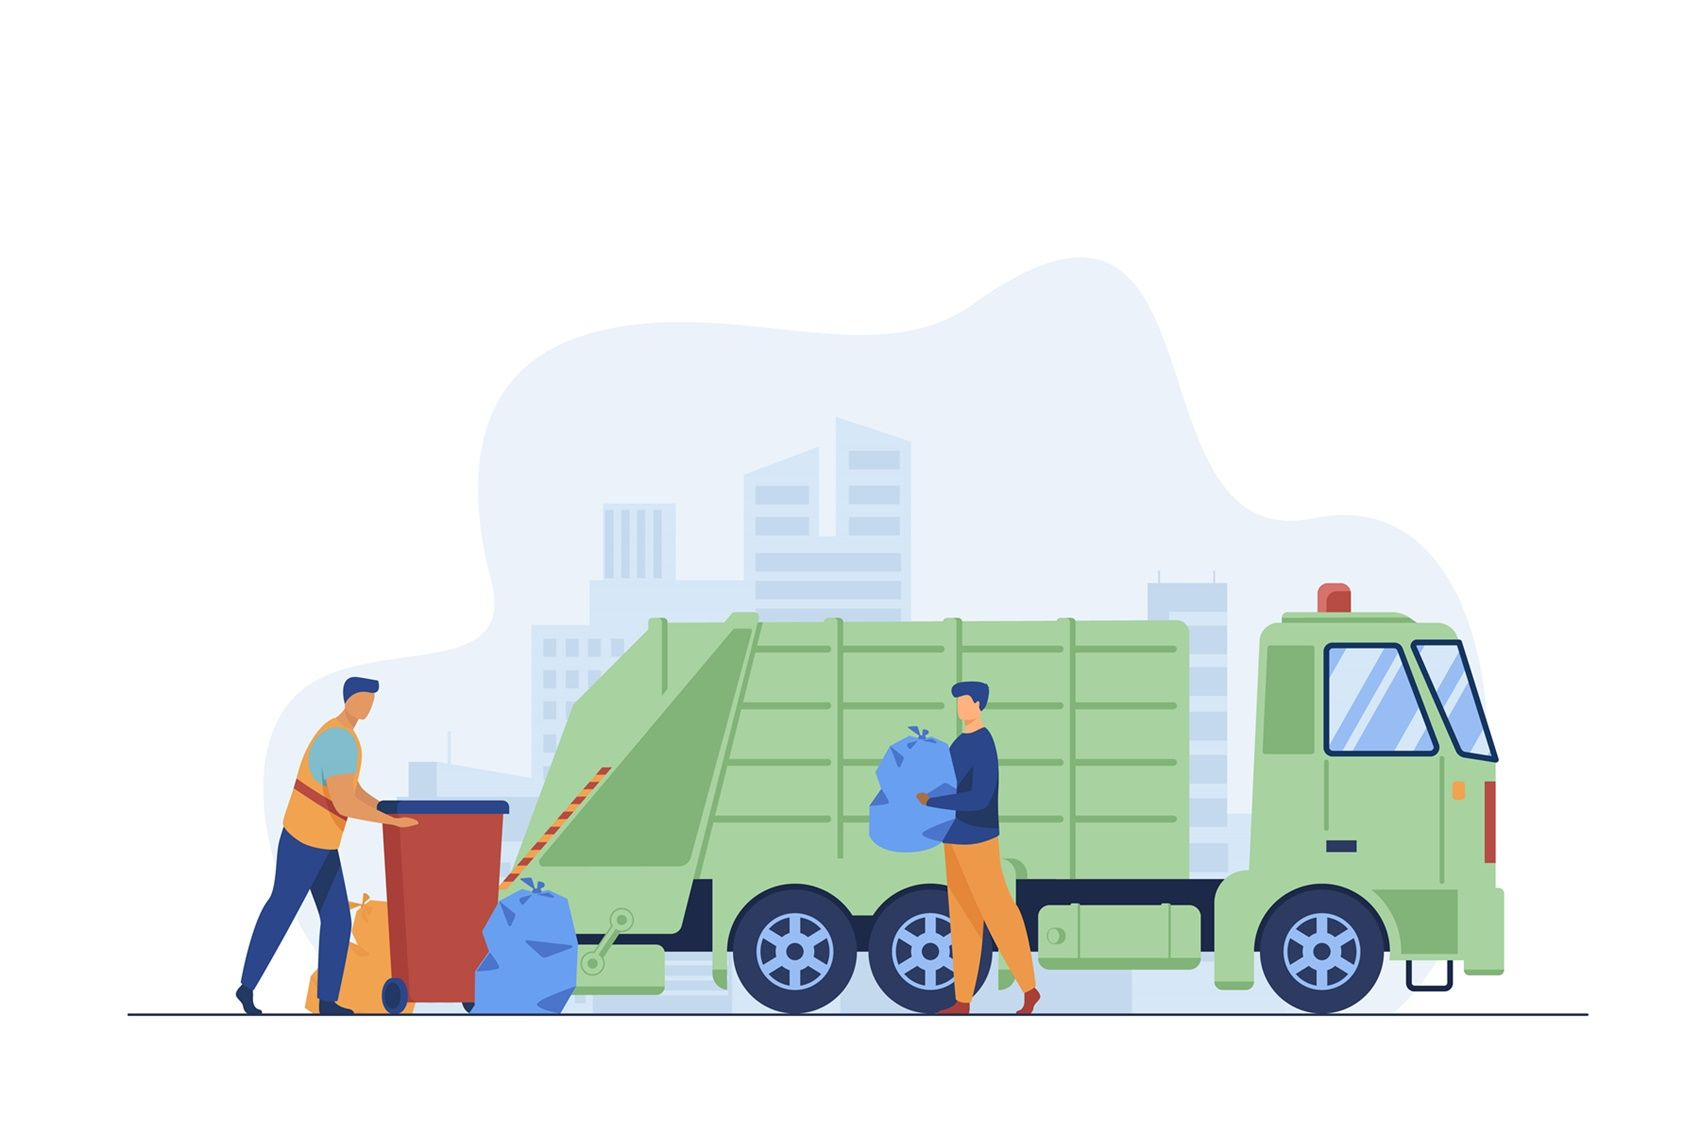 Como fazer o descarte de resíduos da clínica corretamente